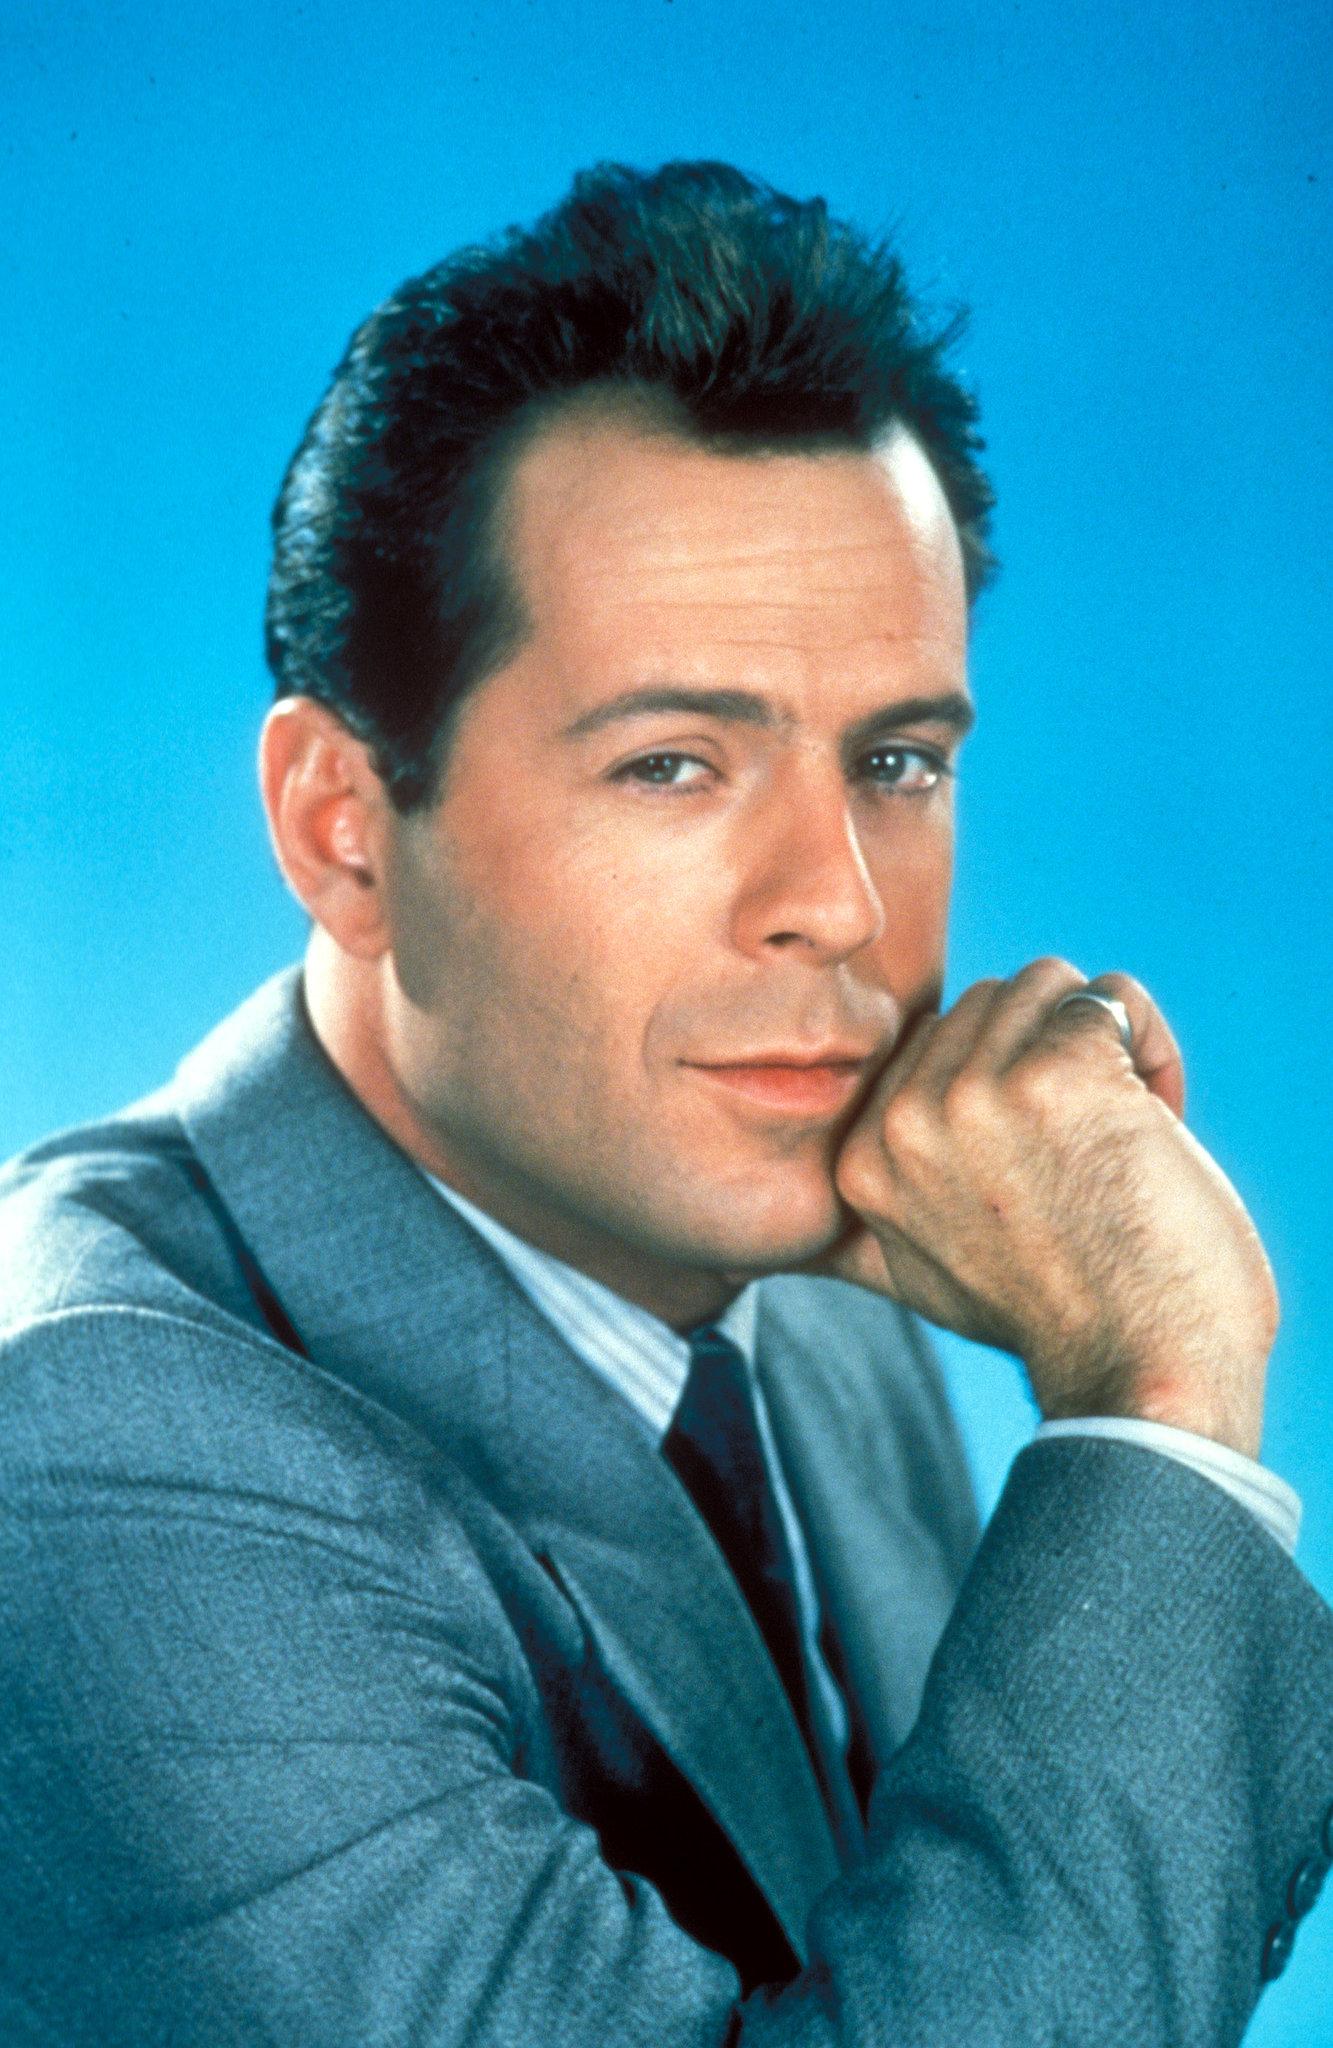 Bruce Willis | 26 Movie Stars You Forgot Were on TV | POPSUGAR ... Bruce Willis